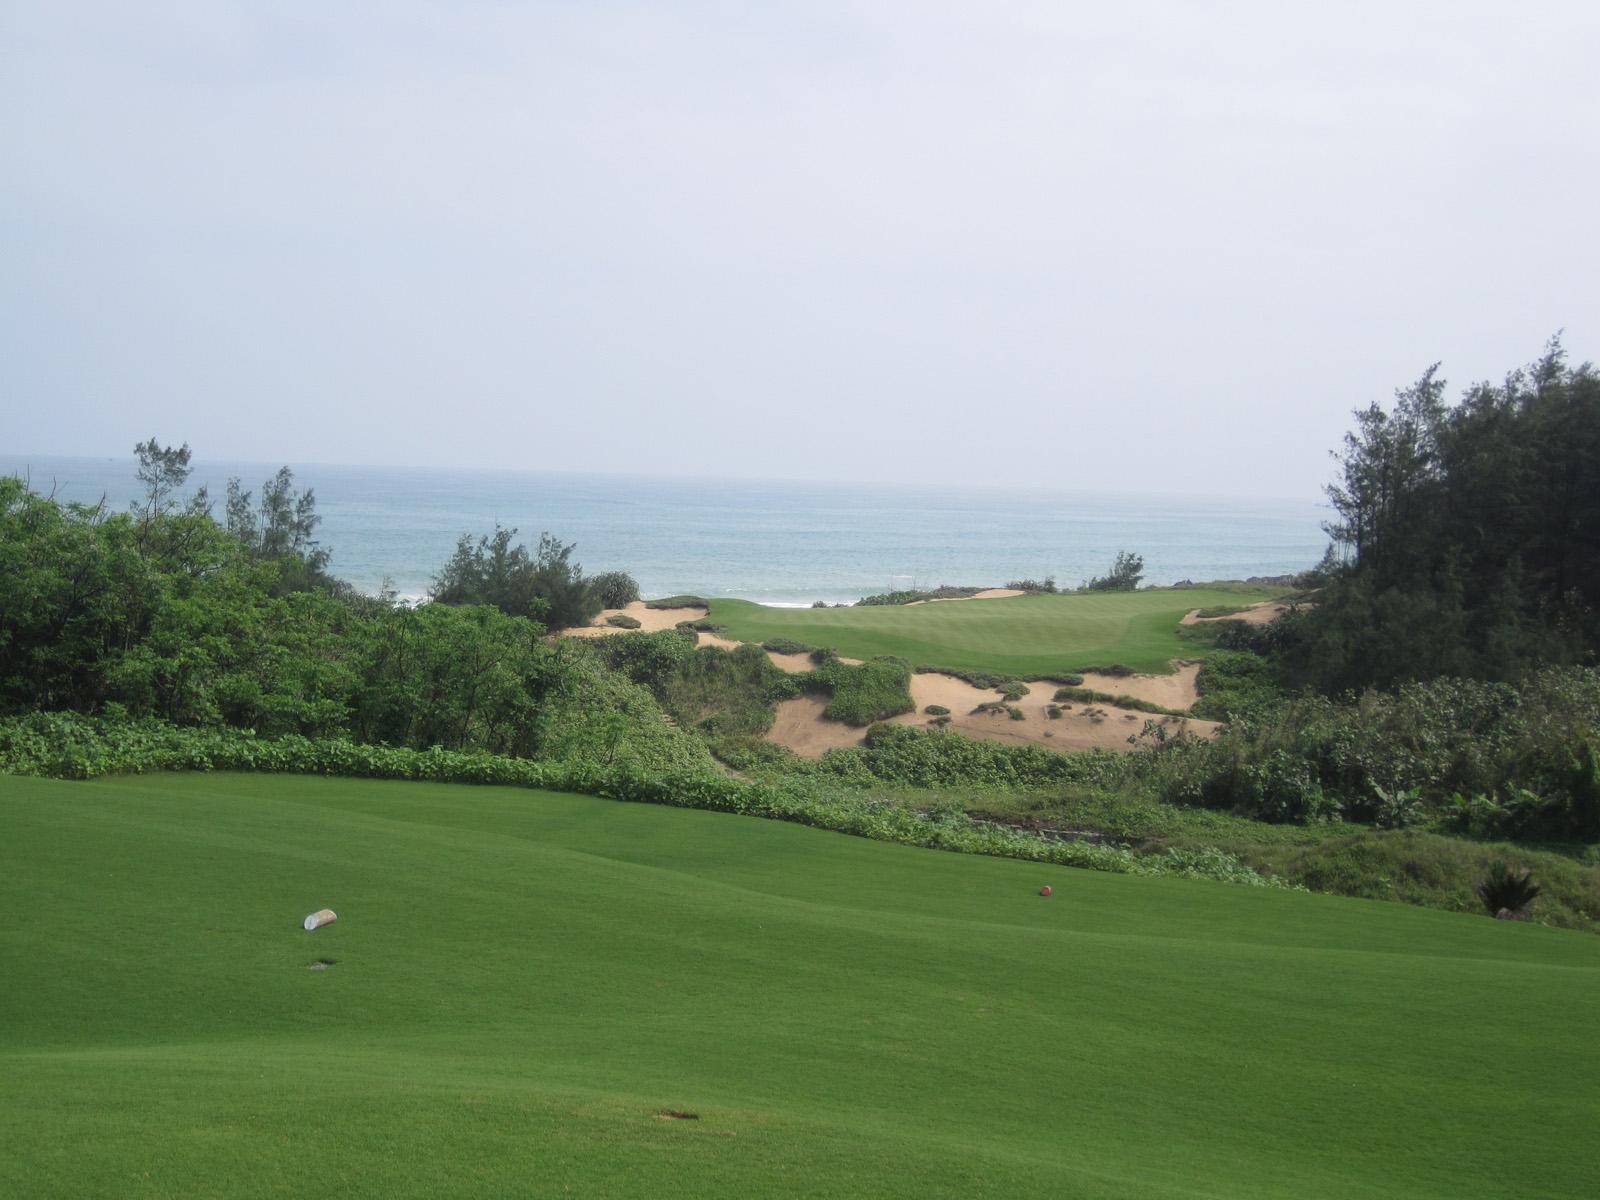 The short, 150 yard 8th hole at Shanqin Bay, South China Sea in the backdrop